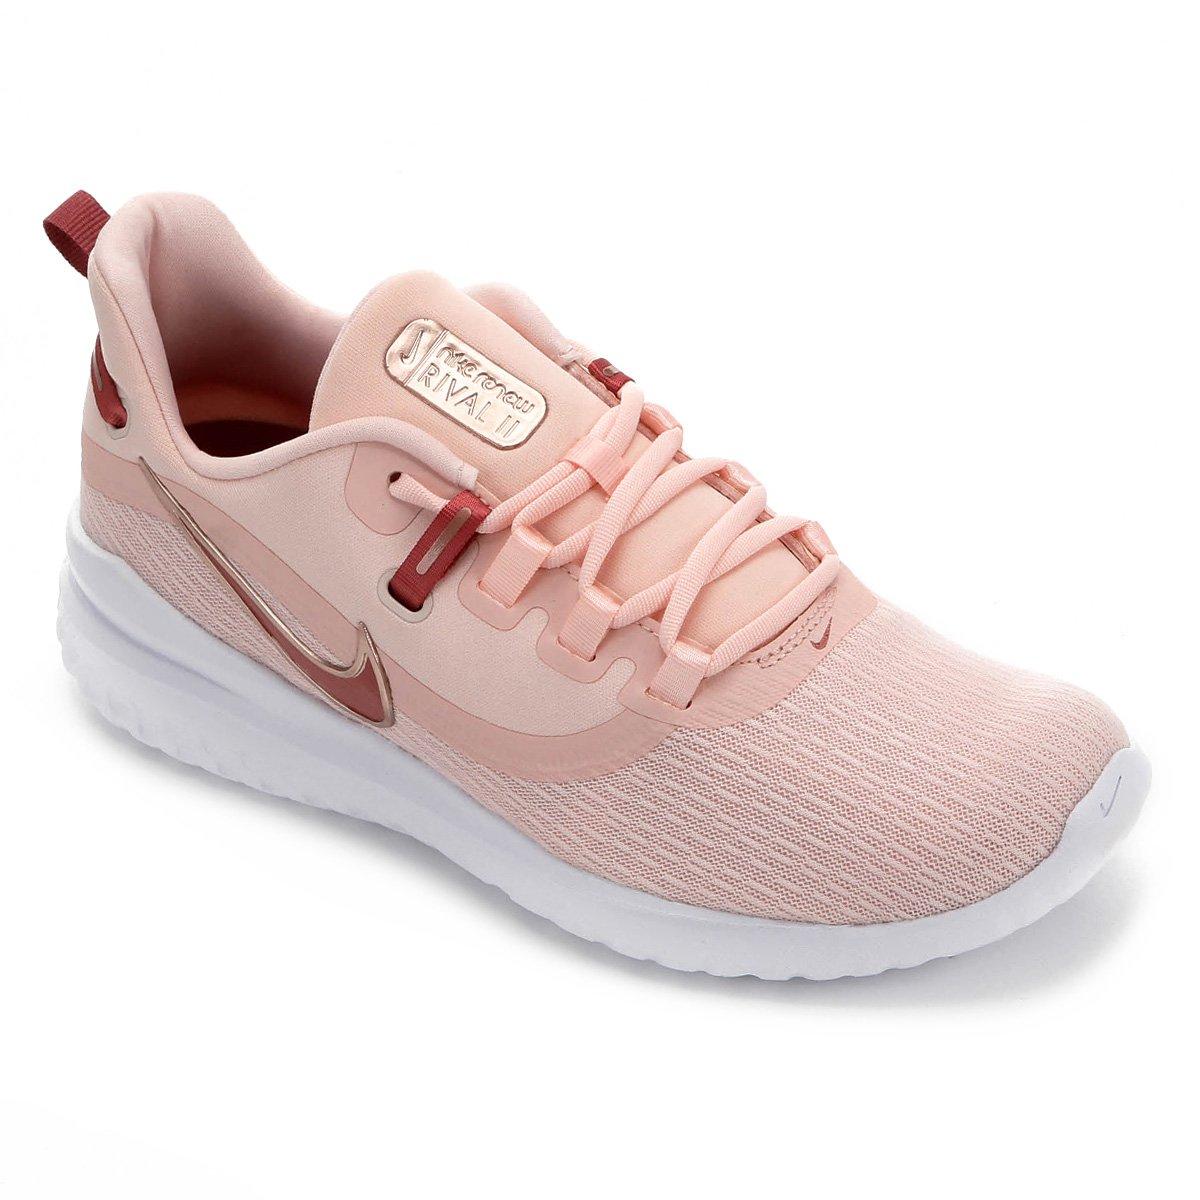 Tênis Nike Renew Rival 2 Feminino Rosa Claro